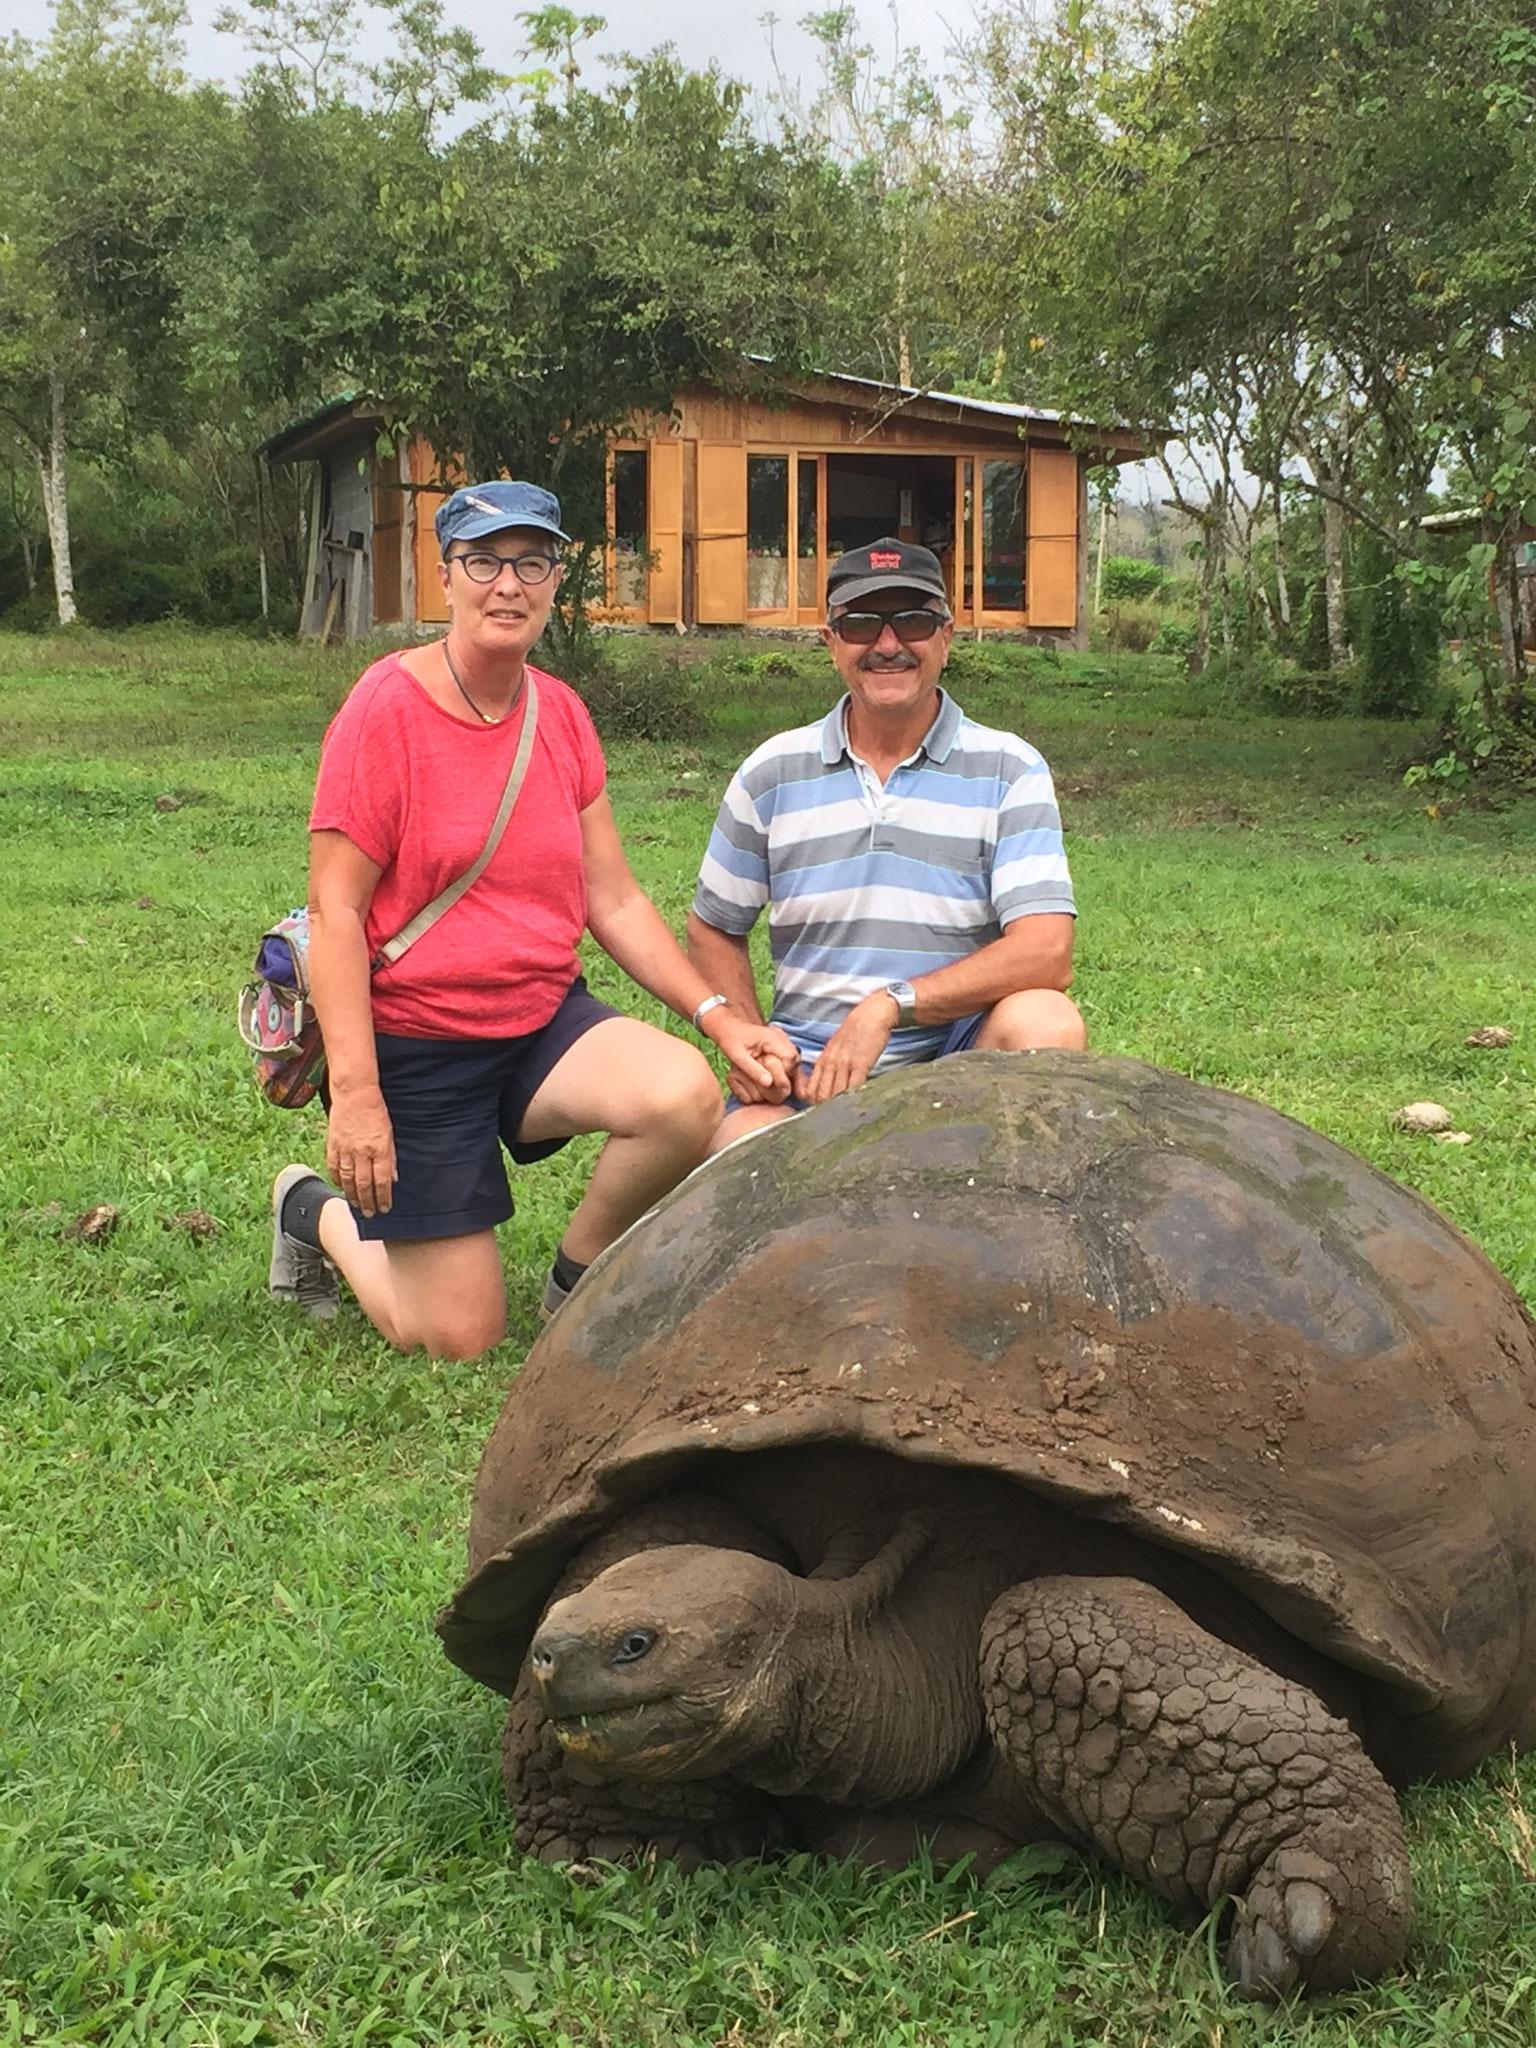 Wildlebende Schildkröten